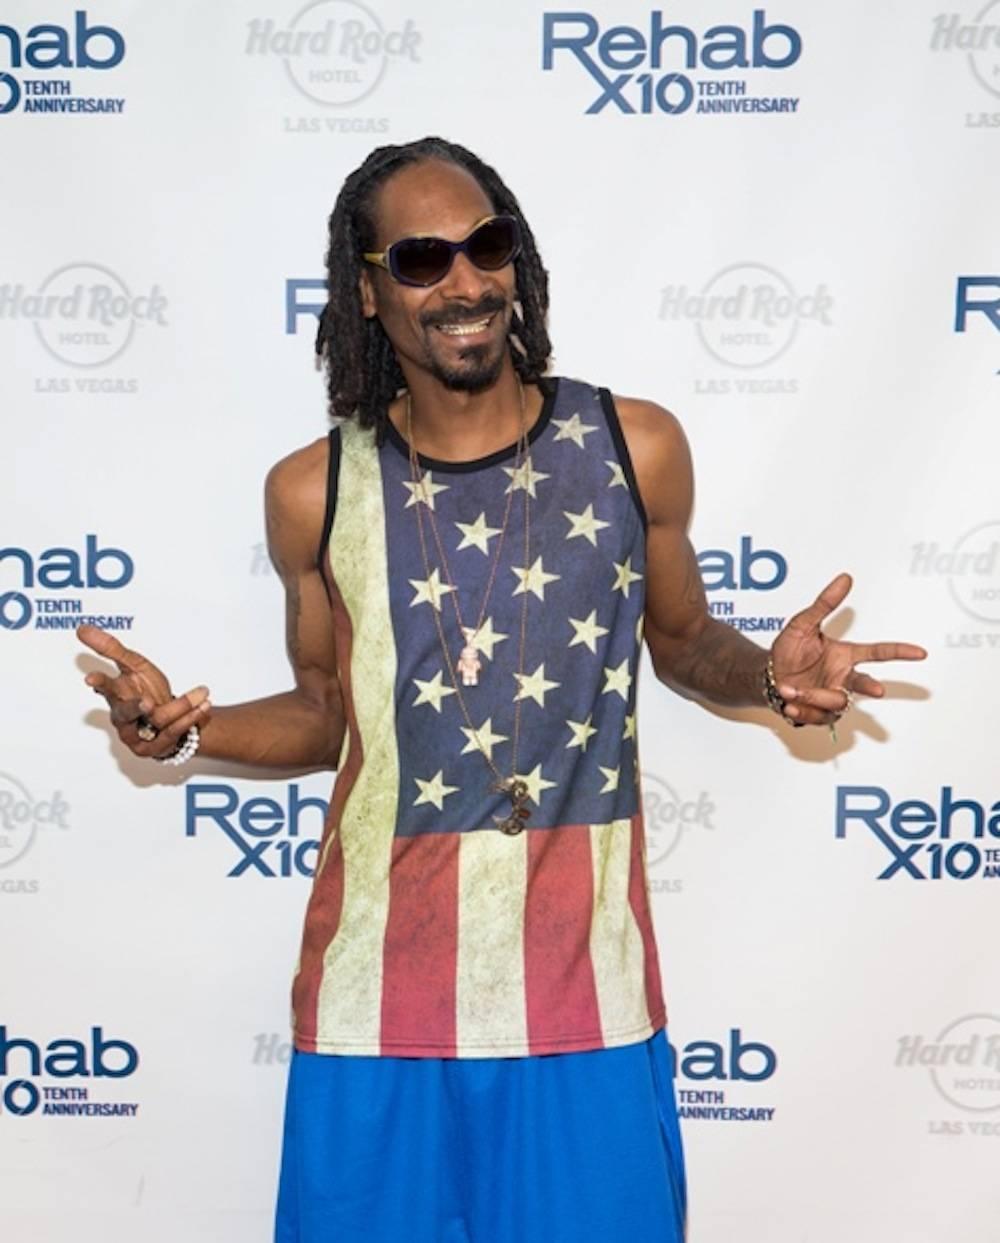 Snoop Dogg AKA Snoop Lion